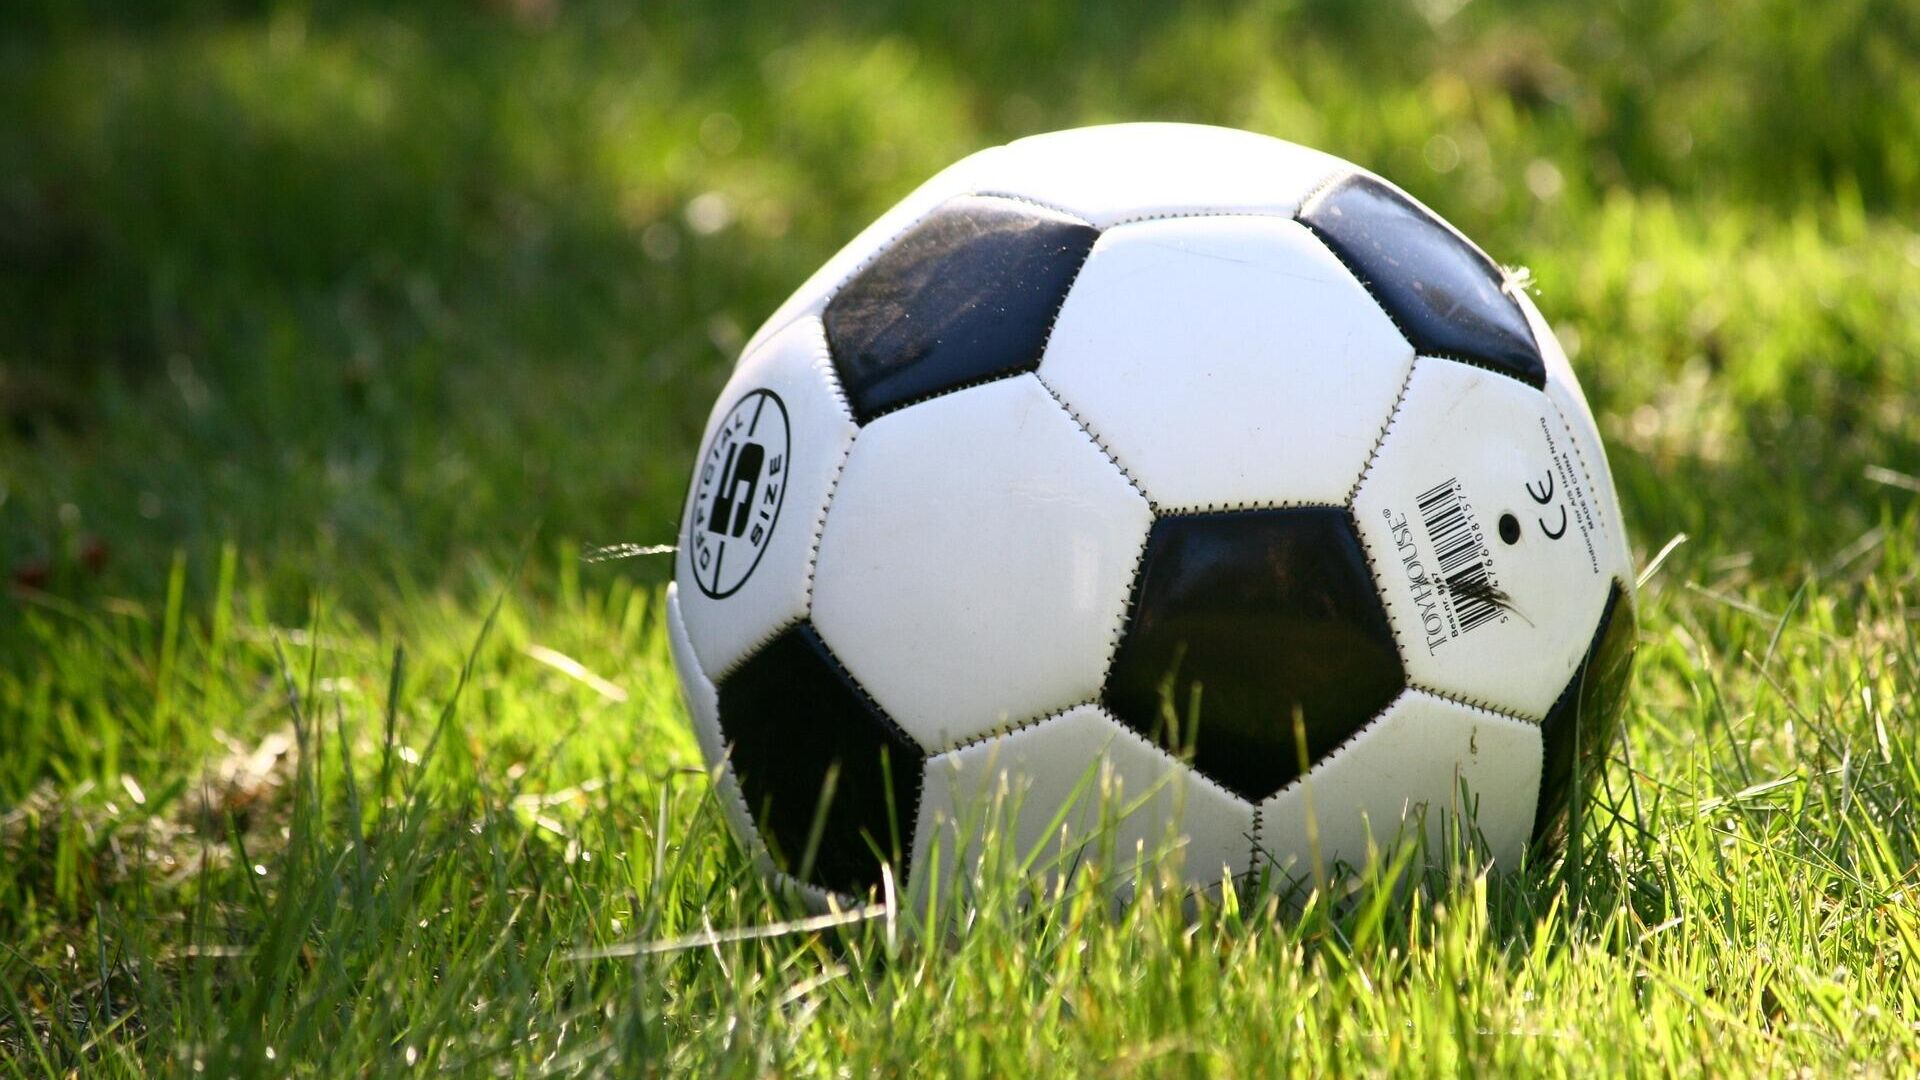 balón de fútbol (imagen referencial) - Sputnik Mundo, 1920, 25.07.2021